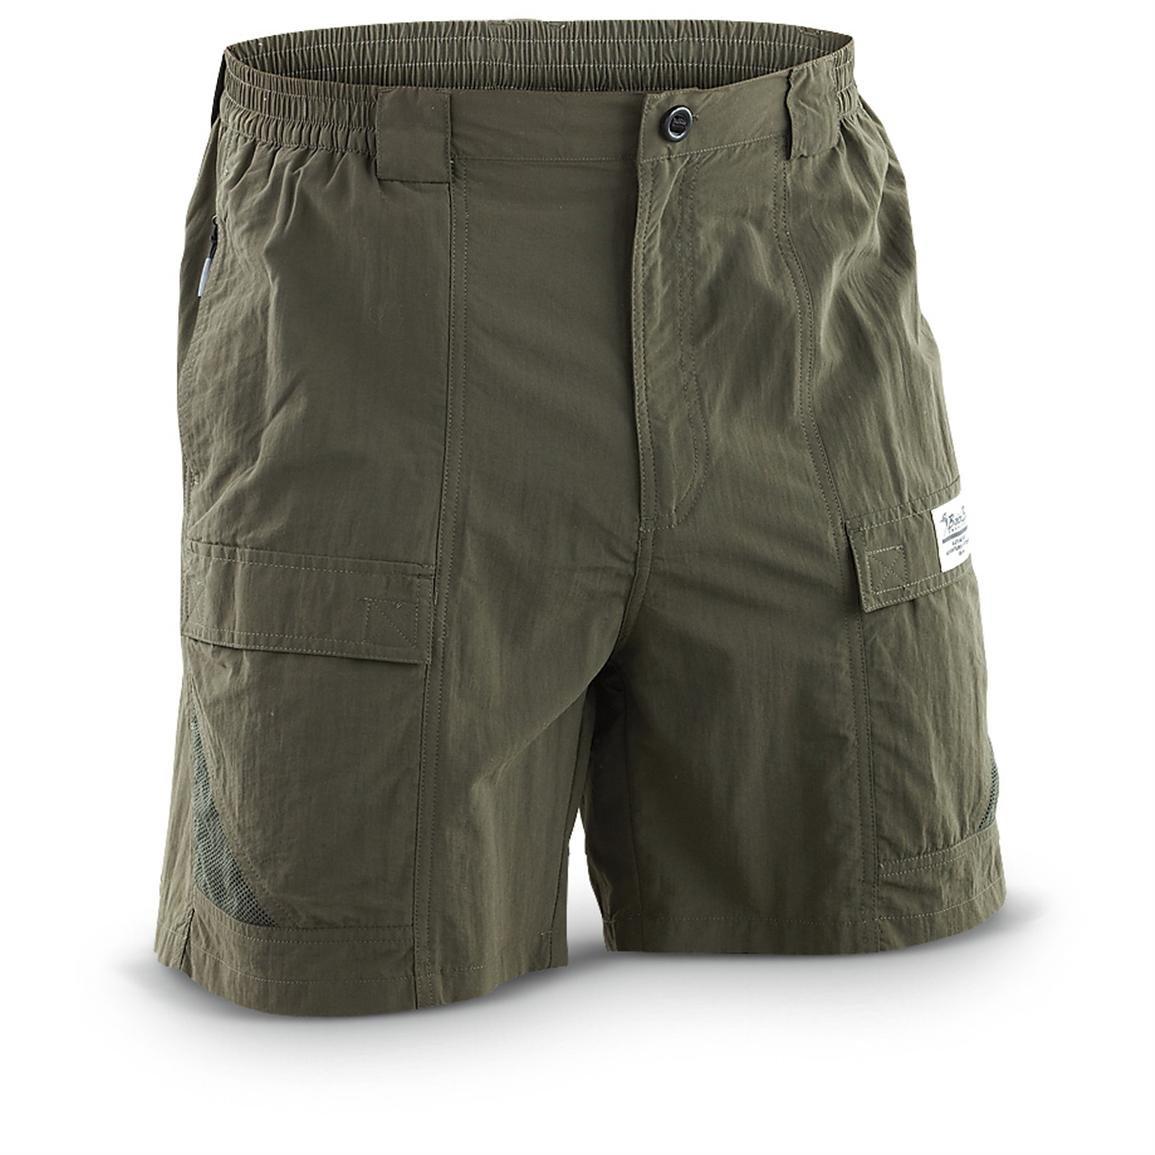 Bimini Bay Outfitters Men's Grand Cayman Nylon Short (2-Pack) (Olive, Medium) by Bimini Bay Outfitters